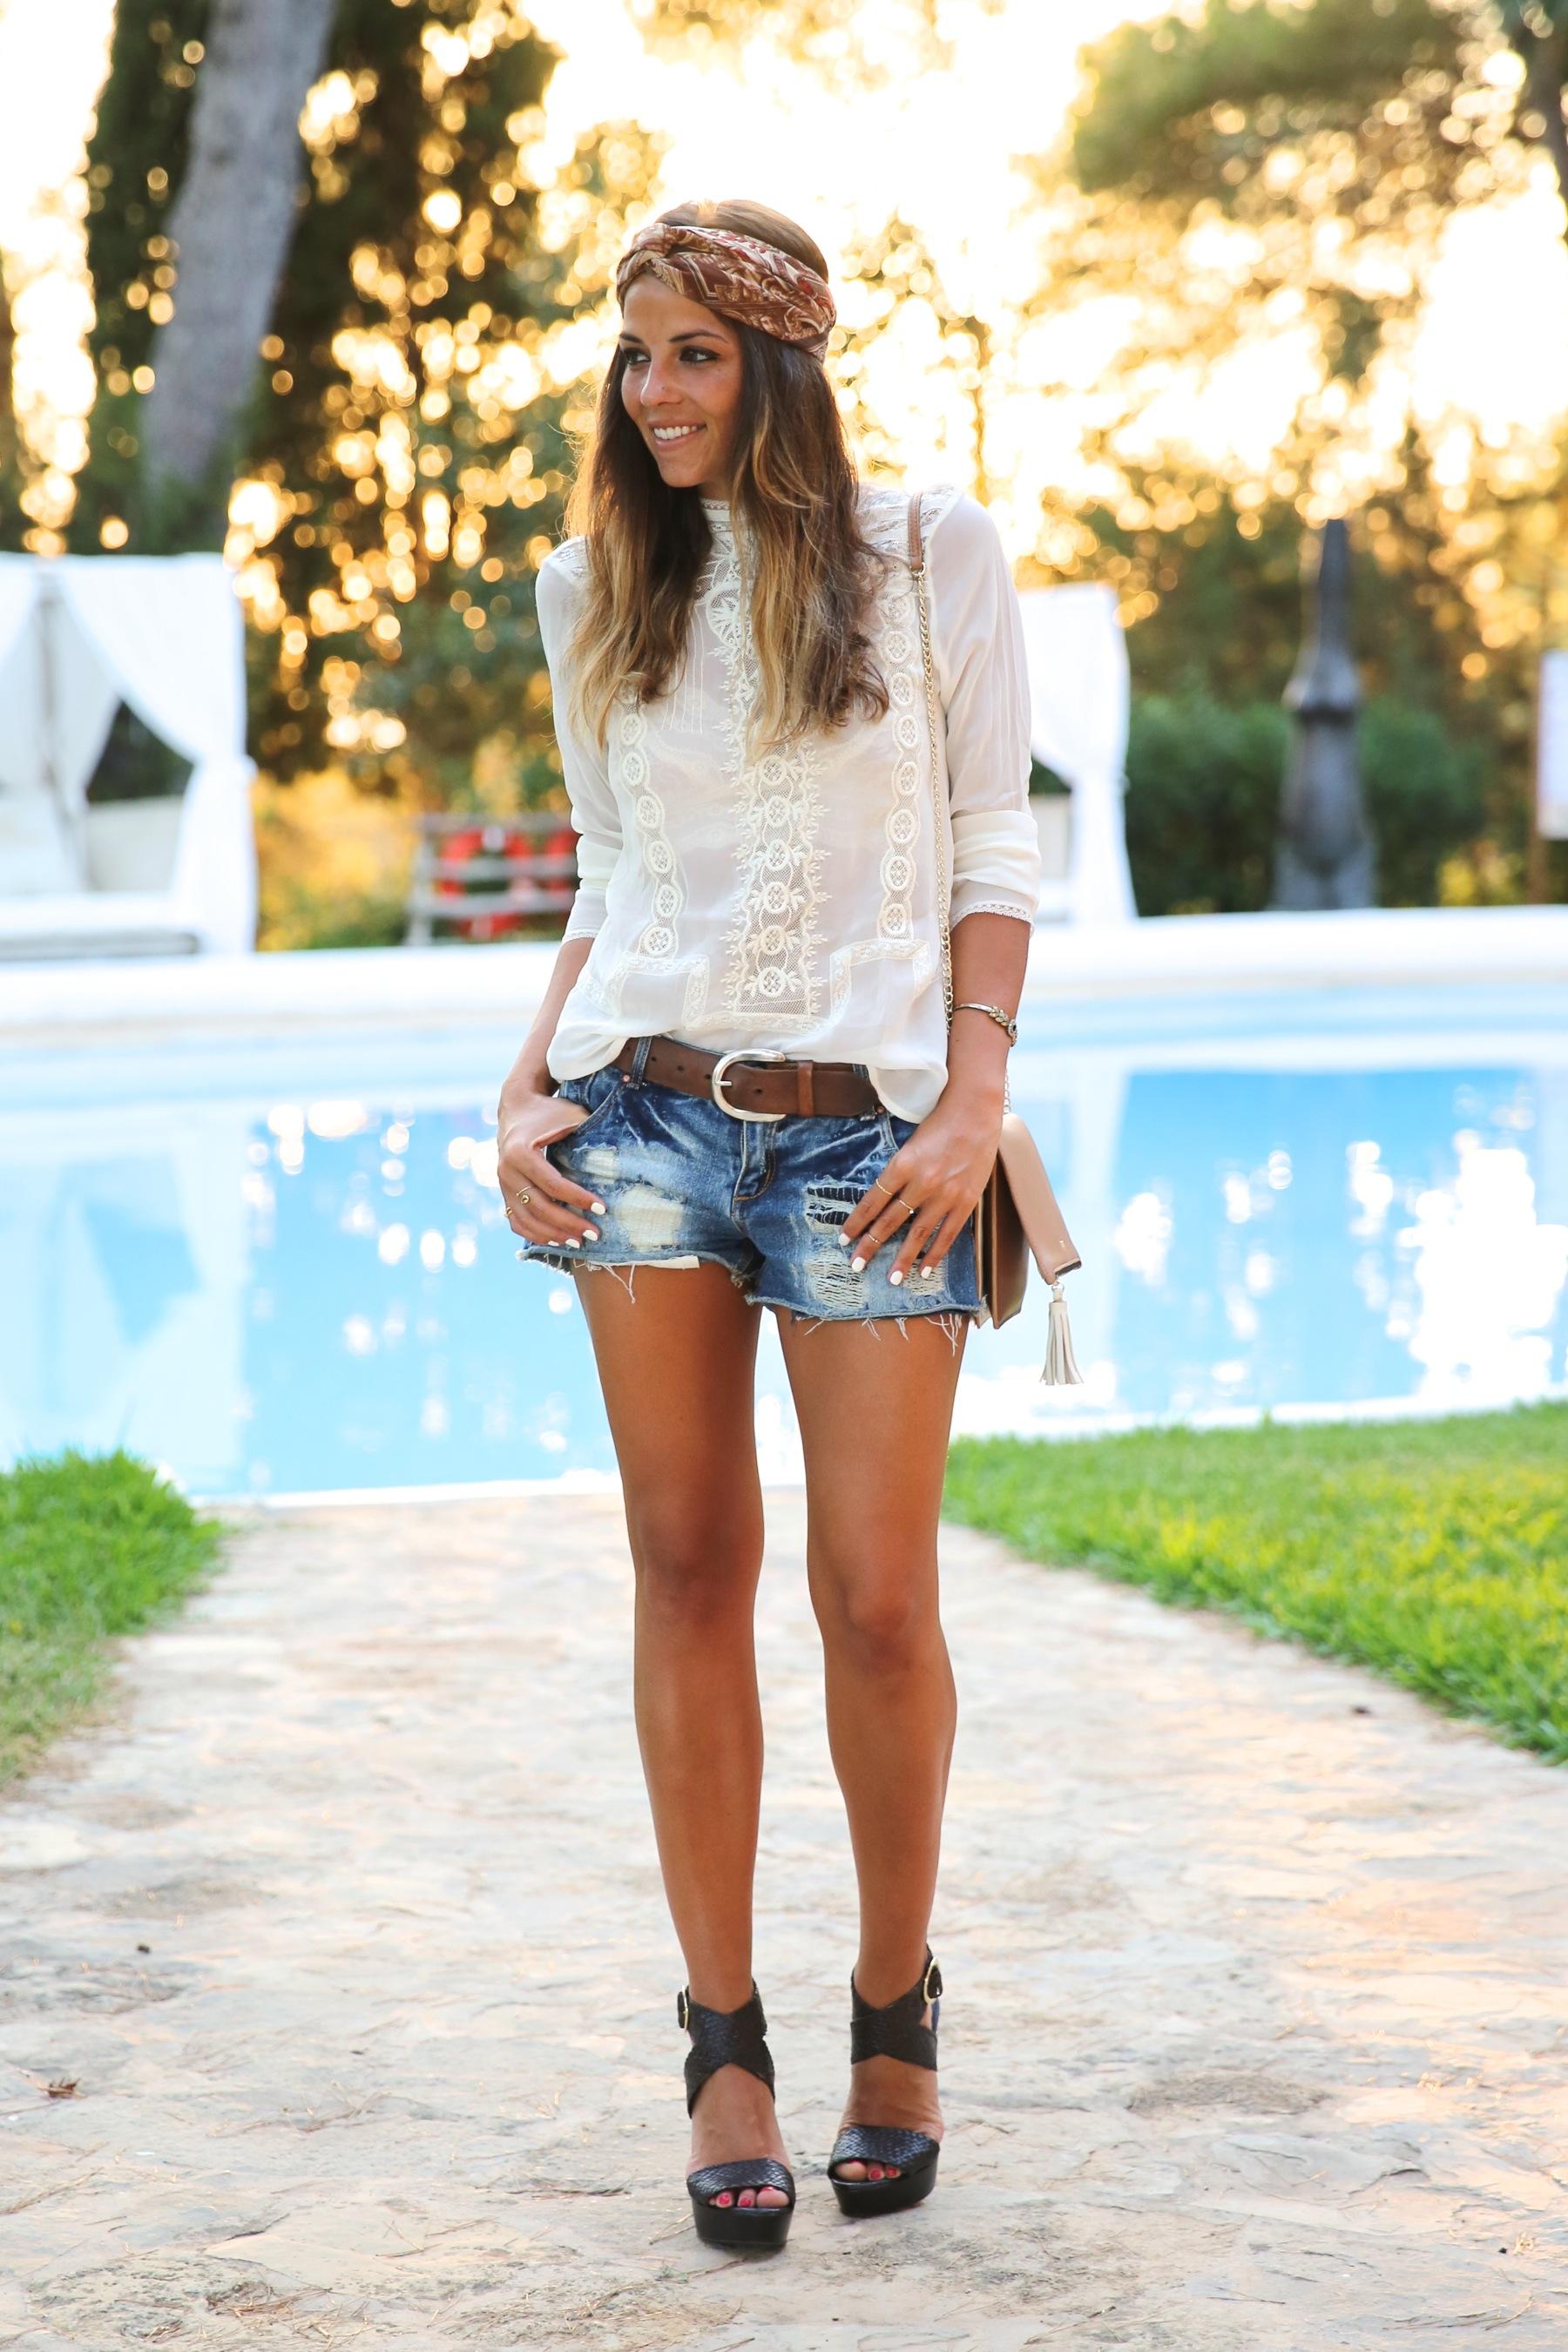 trendy_taste-look-outfit-street_style-ootd-blog-blogger-fashion_spain-moda_españa-boho-hippie-denim_shorts-shorts_vaqueros-blusa-blouse-mas34-pg-ibiza-sa_talaia-12